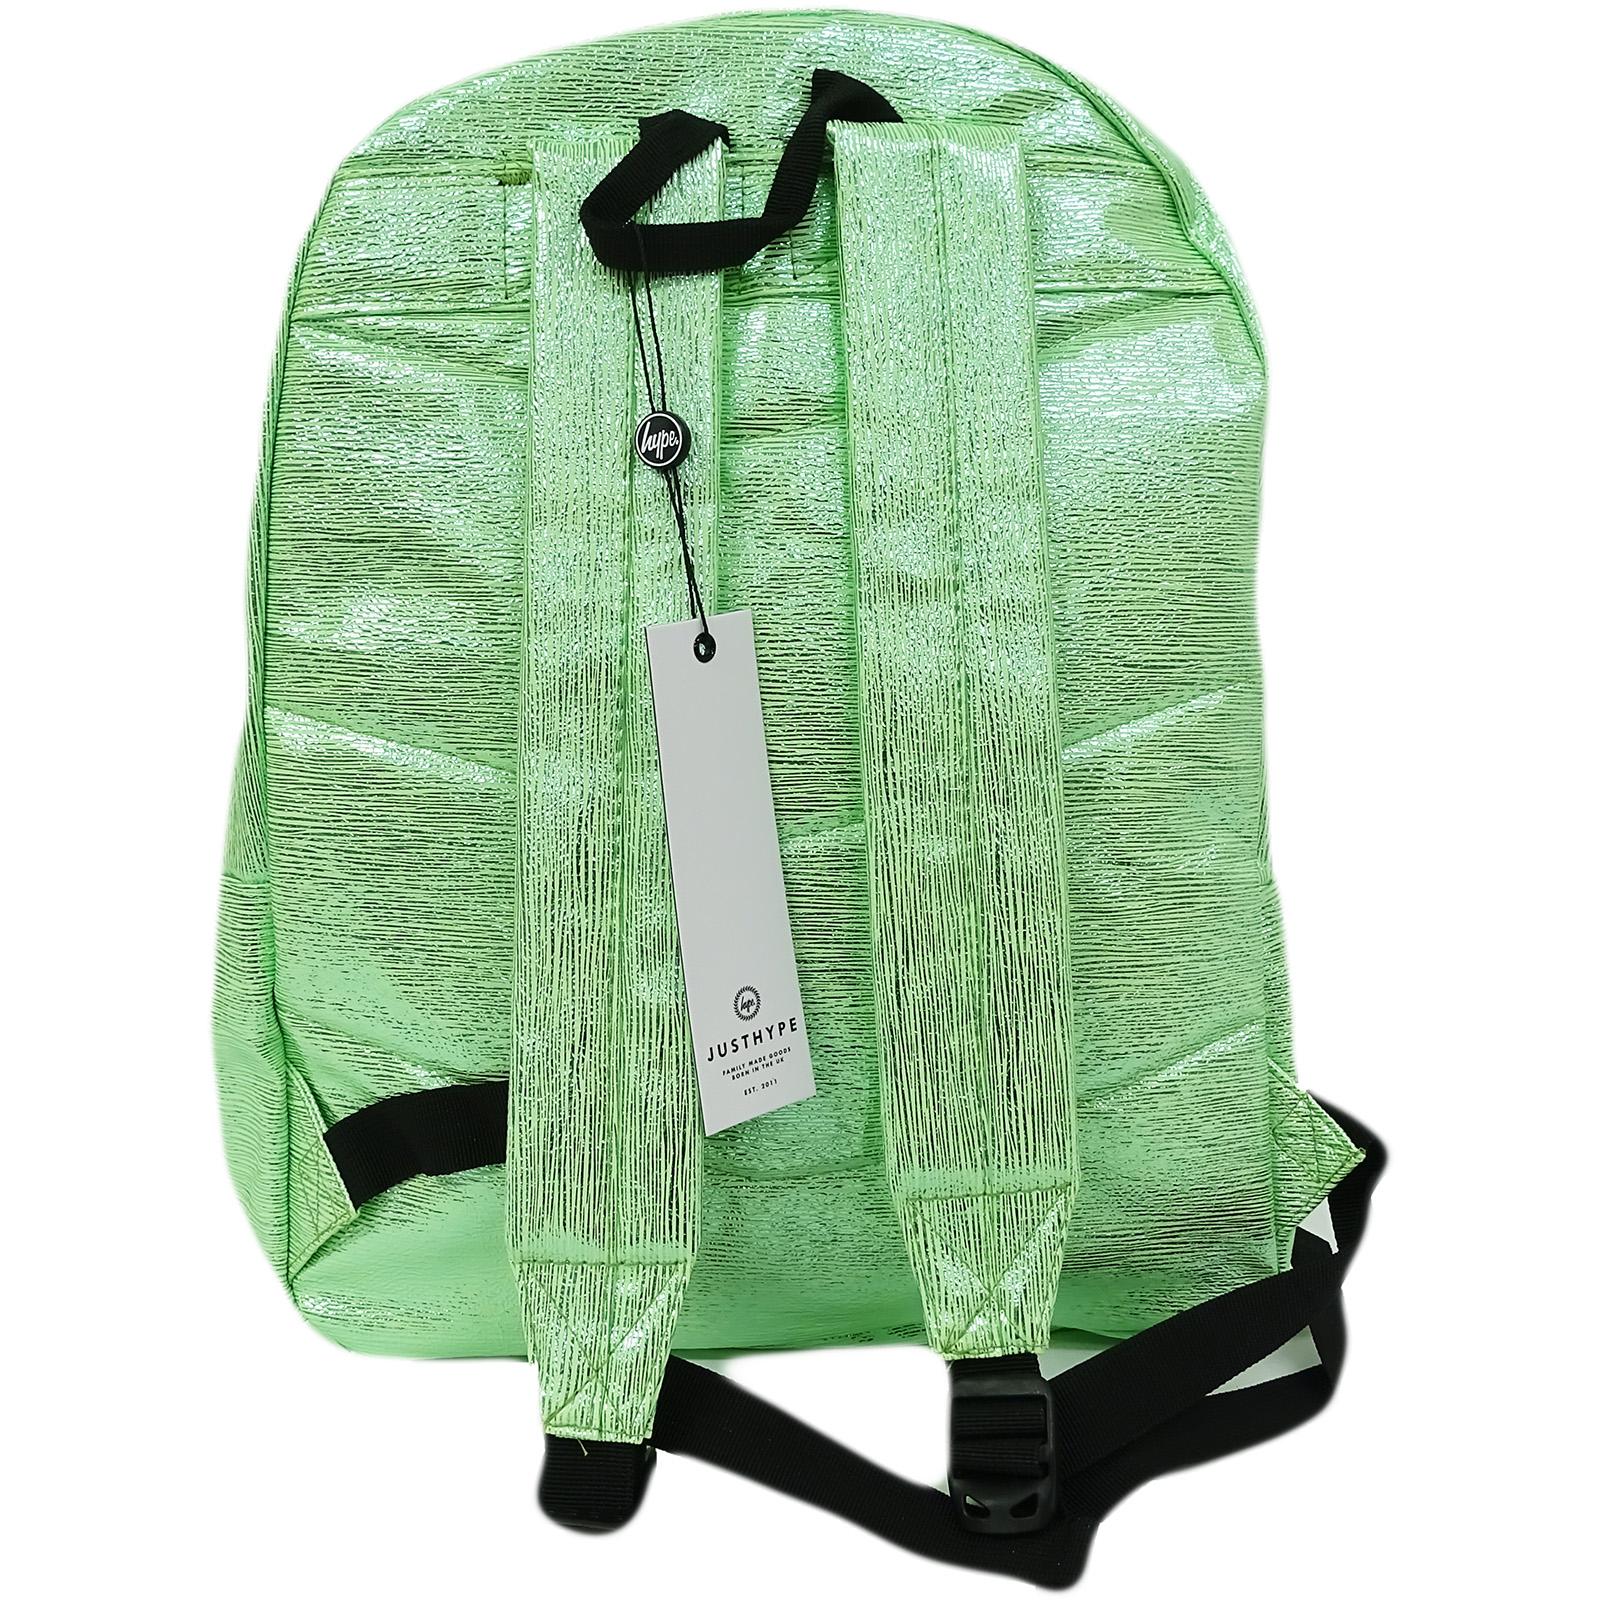 Unisexe-Hype-Sac-A-Dos-Ecole-Gym-SACS-pochettes-pencil-case miniature 51